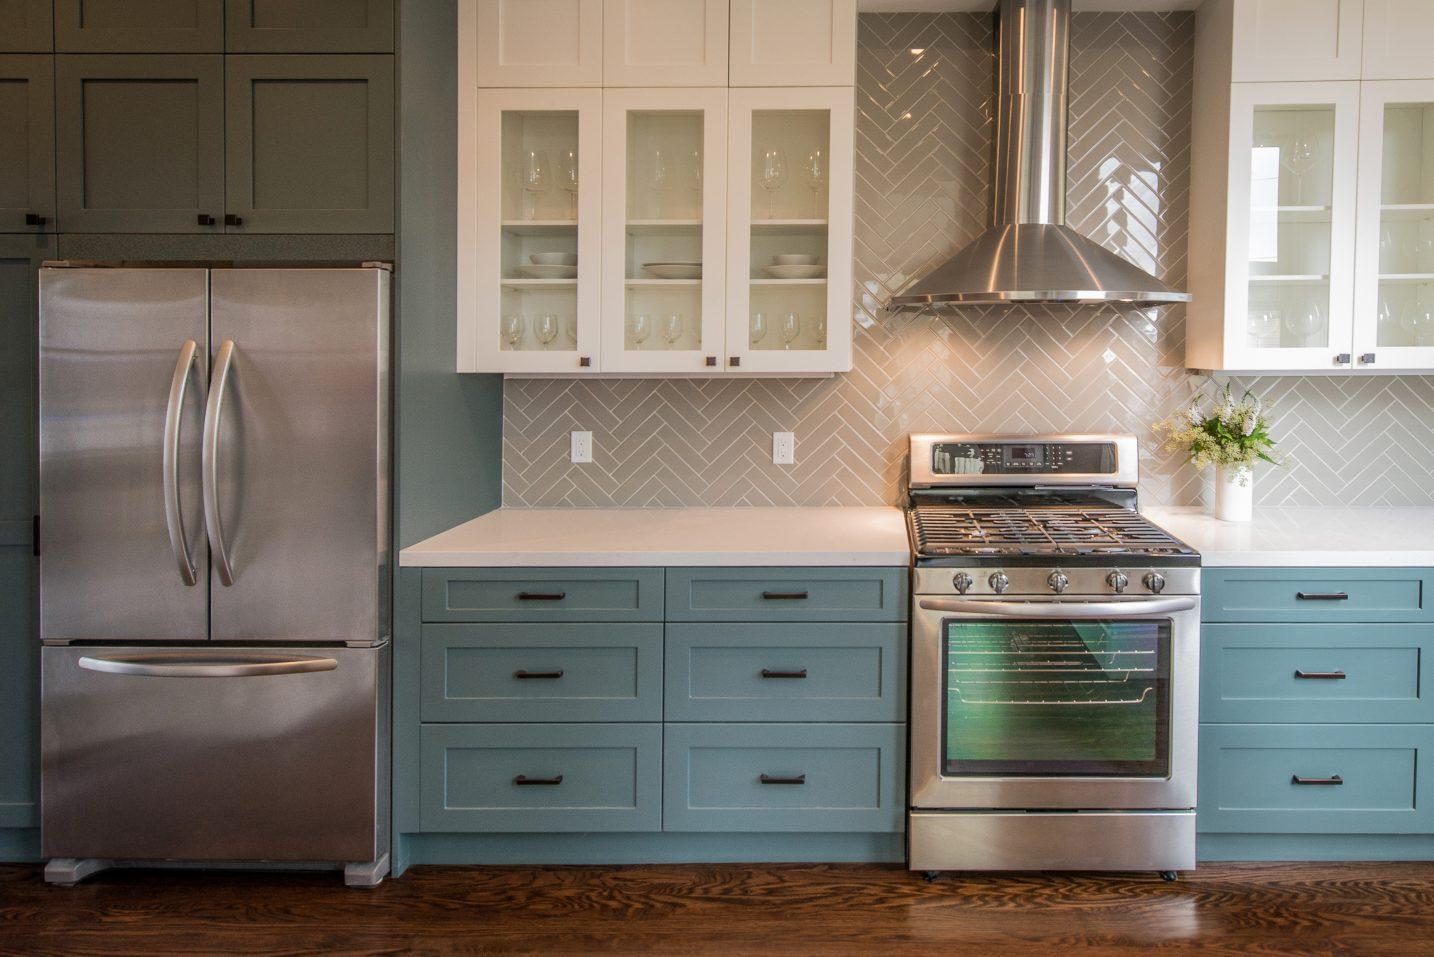 7 Elegant Kitchen Backsplash Tile Ideas Prokitchen Software